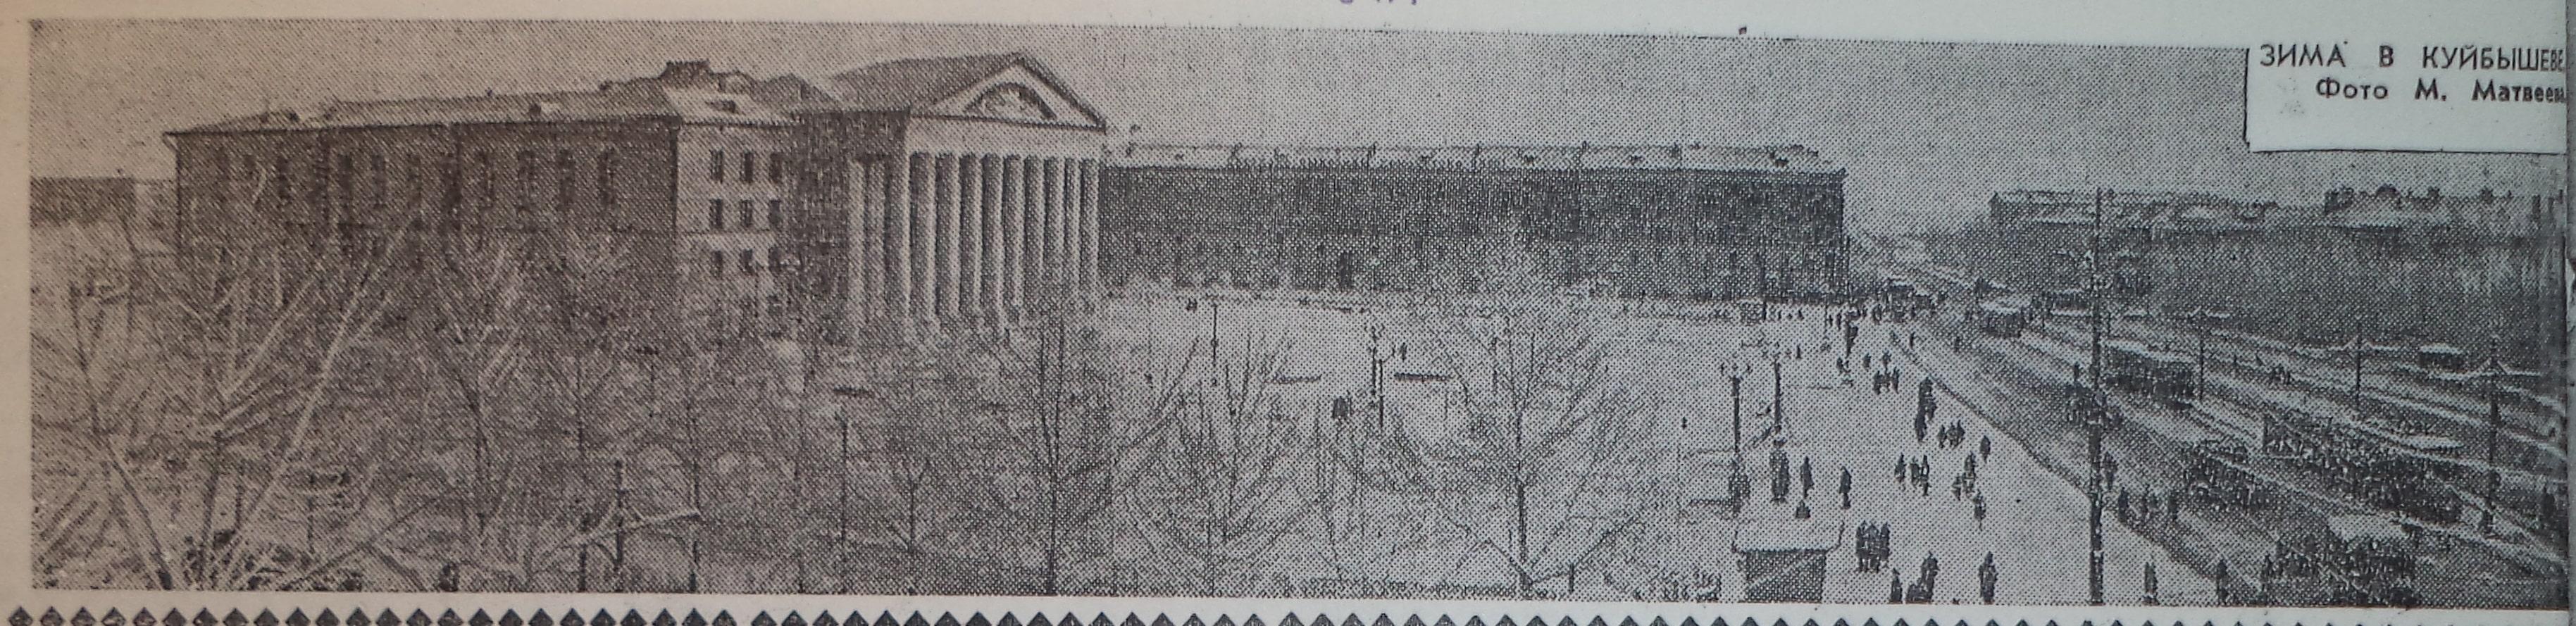 Январь 1964 года Шанхаи Безымянки